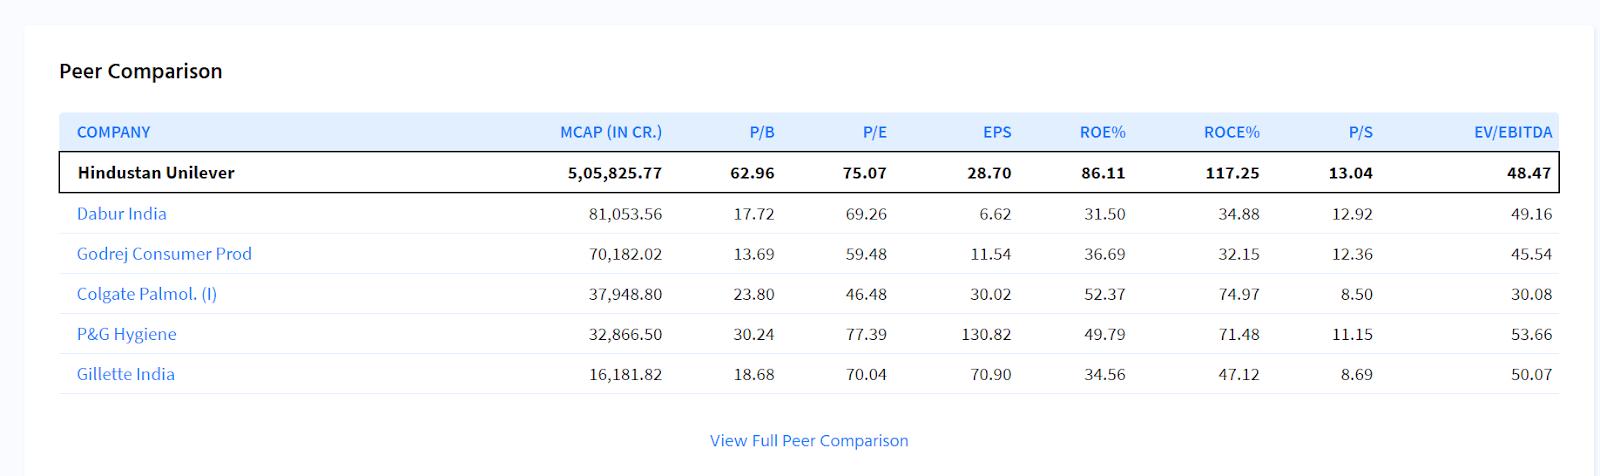 Peer comparison of Hindustan Unilever